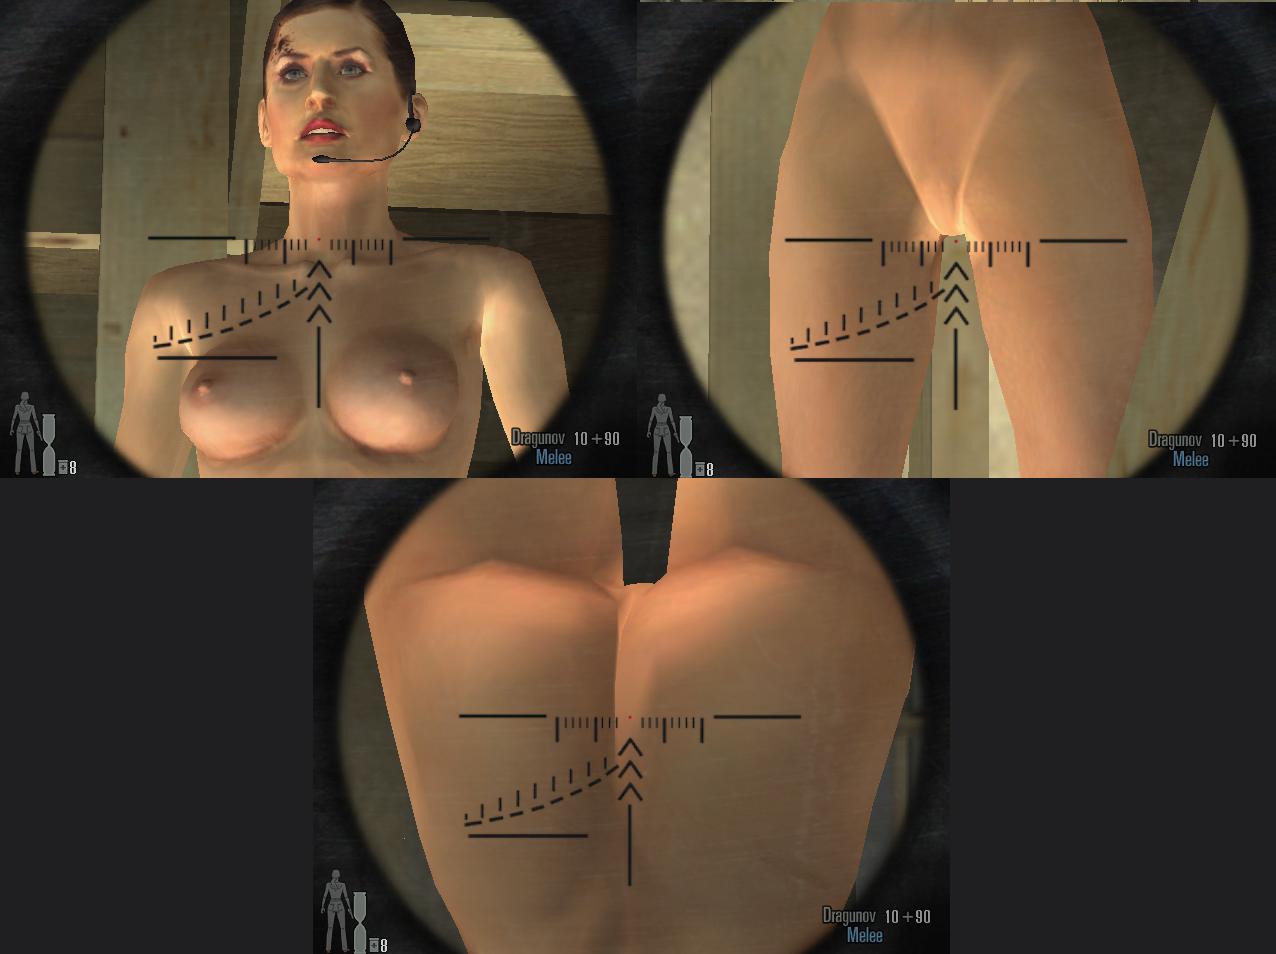 Max Payne Nude Mona 42